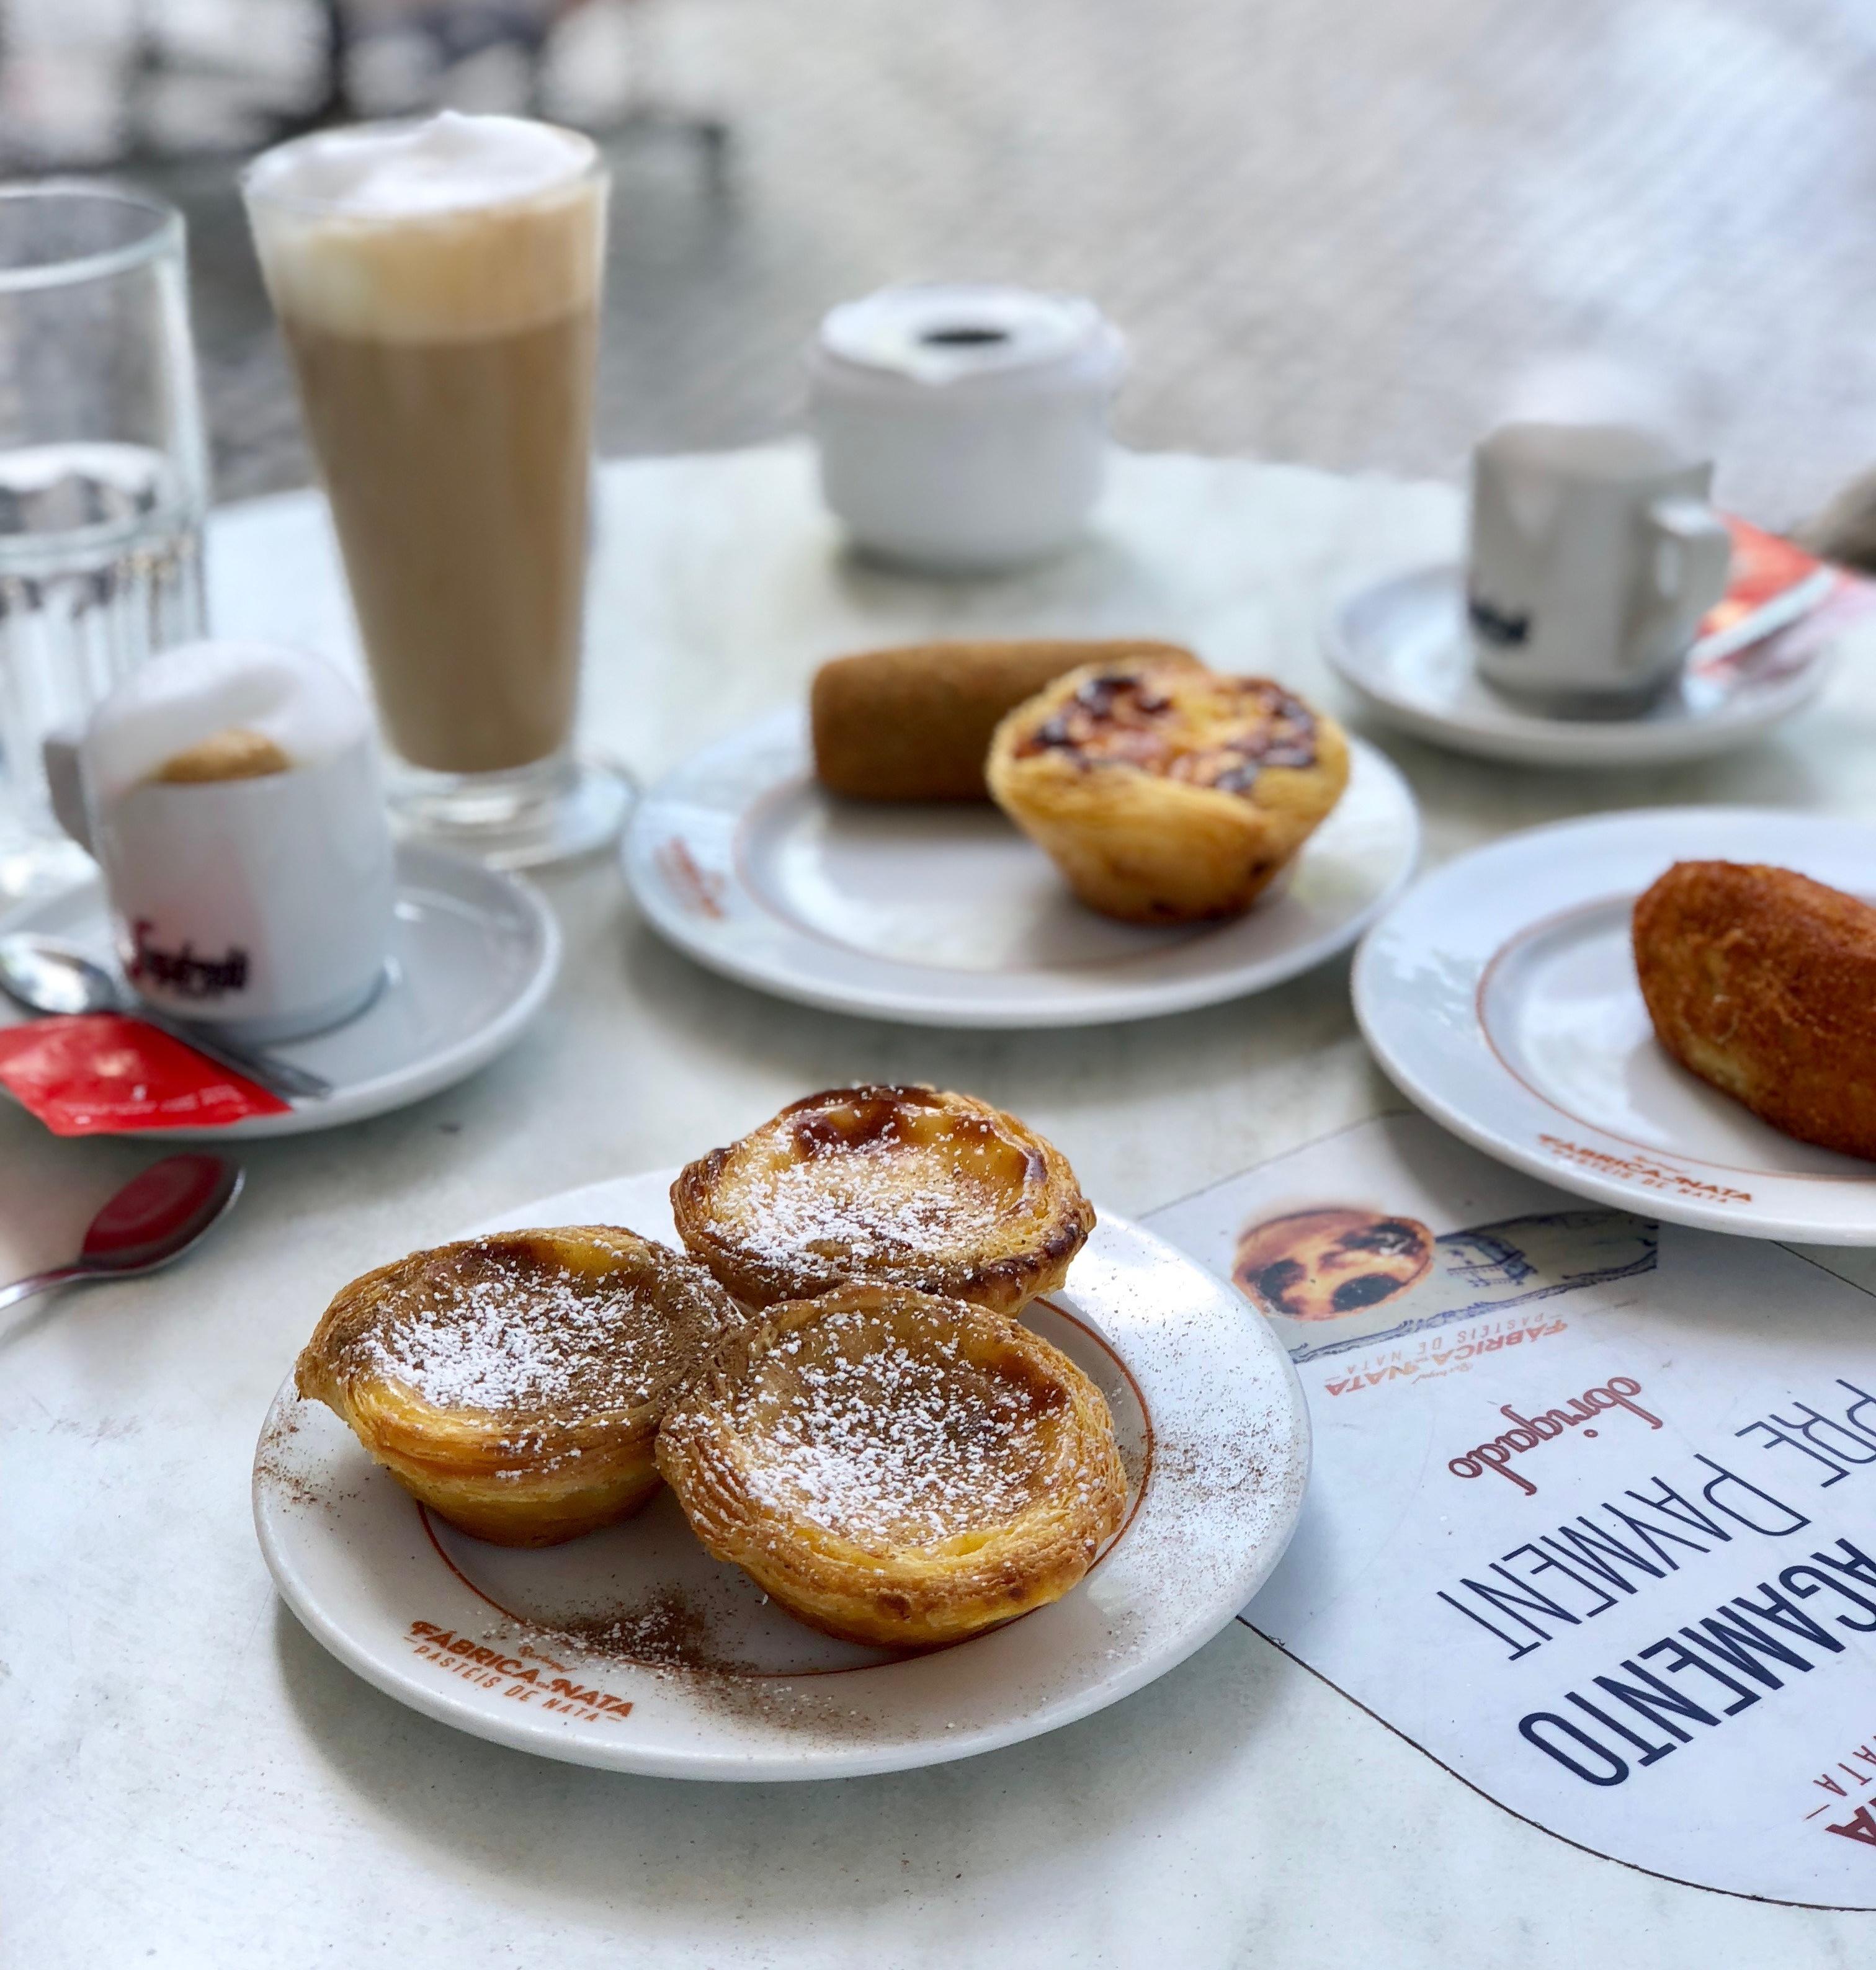 Pasteis de nata fabrica da nata food Lisbon Lisboa Portugal Cristina Nogueras